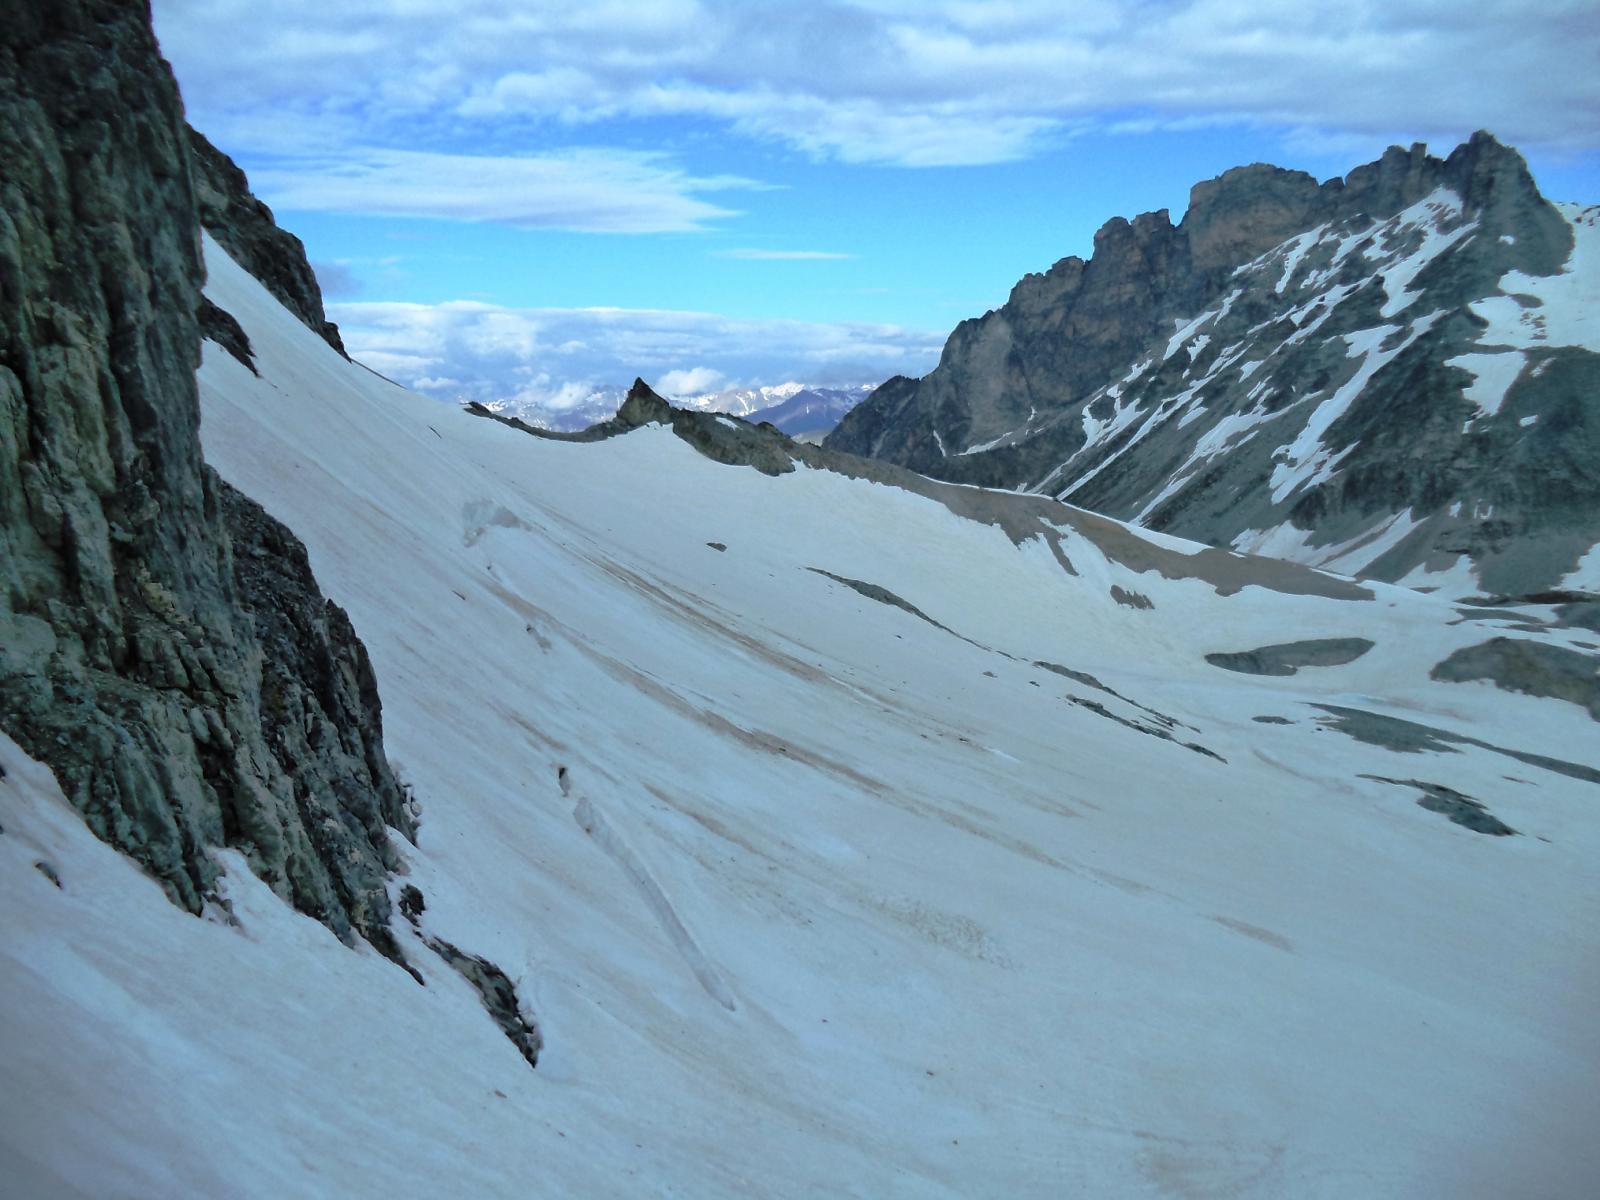 ghiacciaio del sommeiller e rognosa